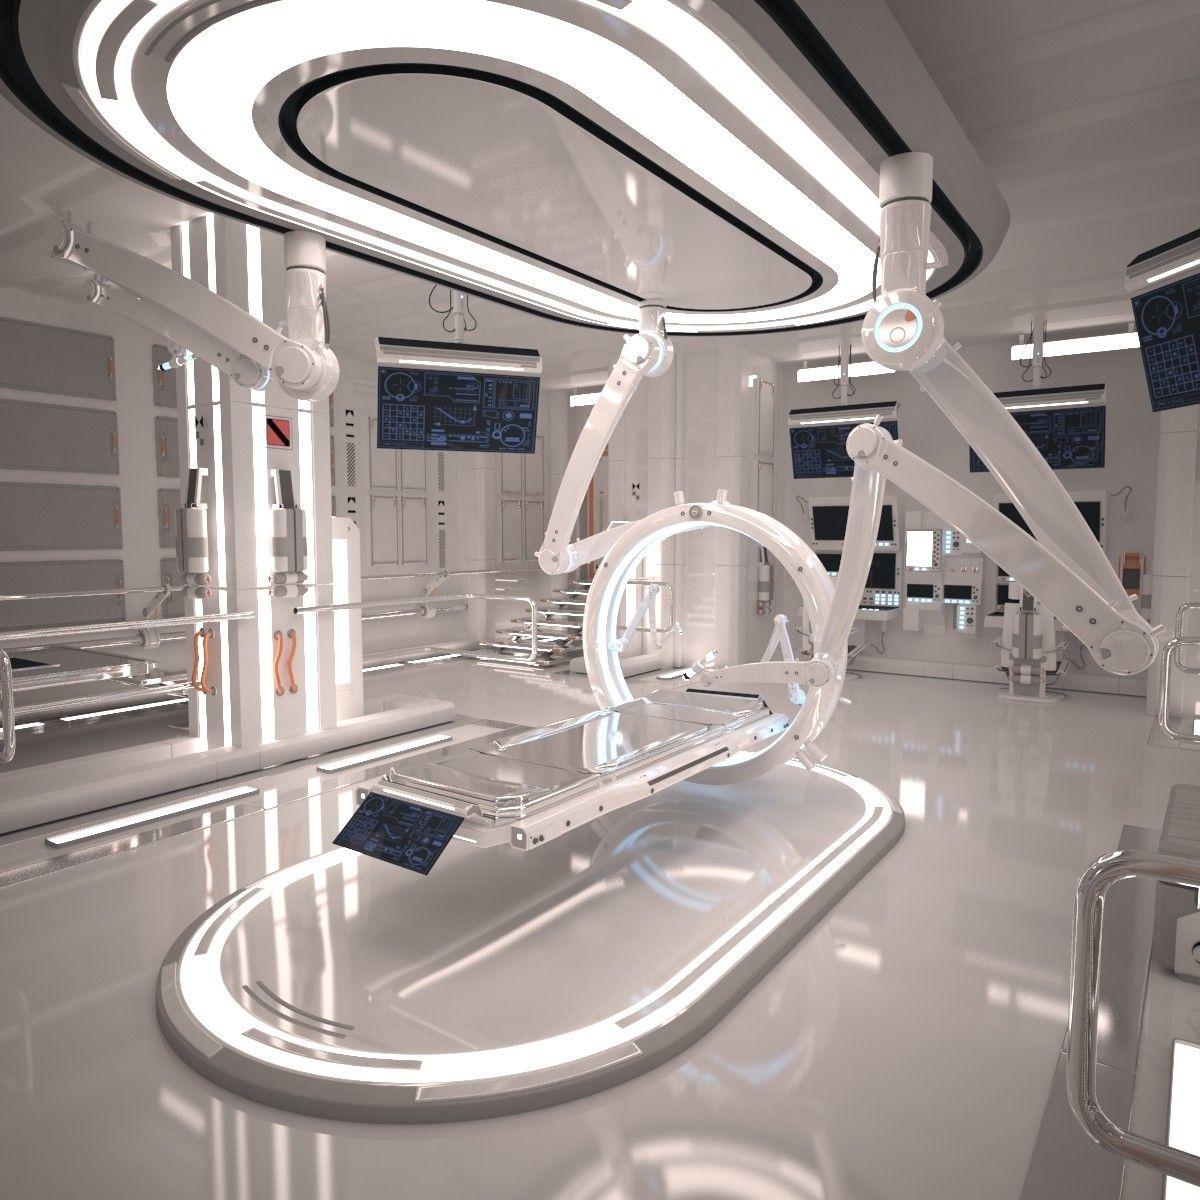 3d futuristic sci fi laboratory interior shots pinterest science fiction int rieur. Black Bedroom Furniture Sets. Home Design Ideas